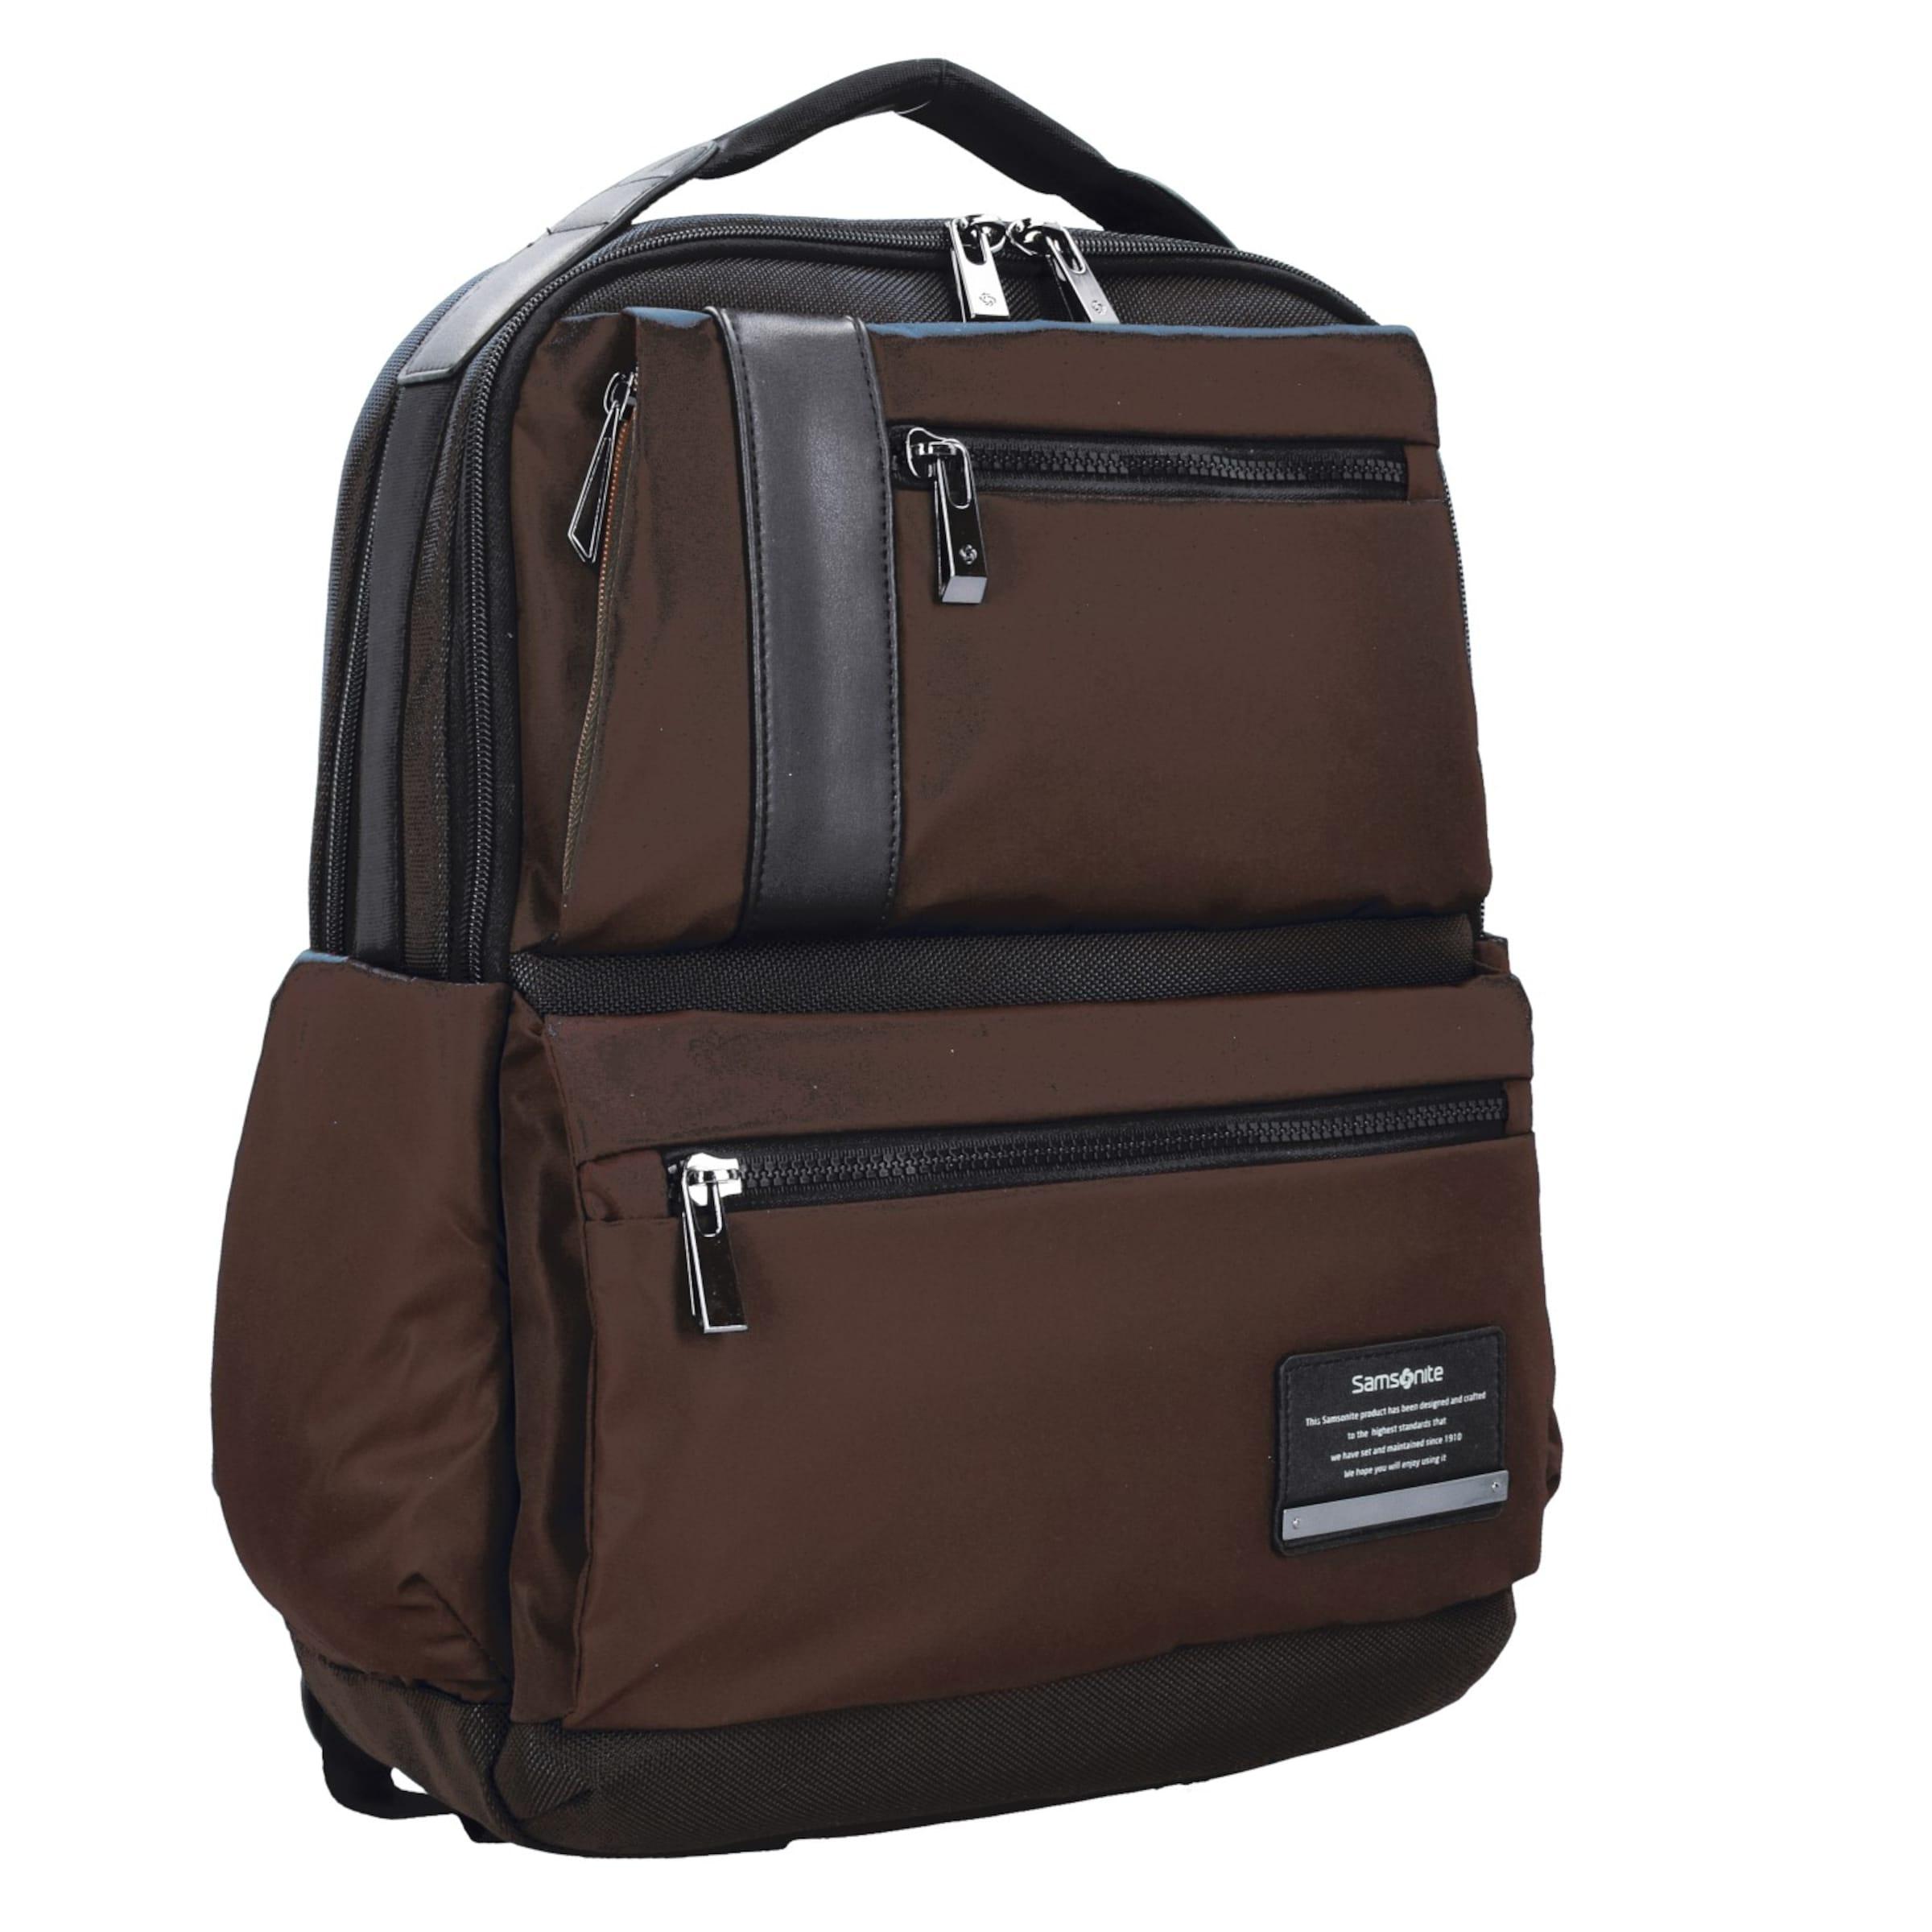 Cm In Laptopfach Samsonite Openroad Business BraunSchwarz Rucksack Leder 42 wO0nPk